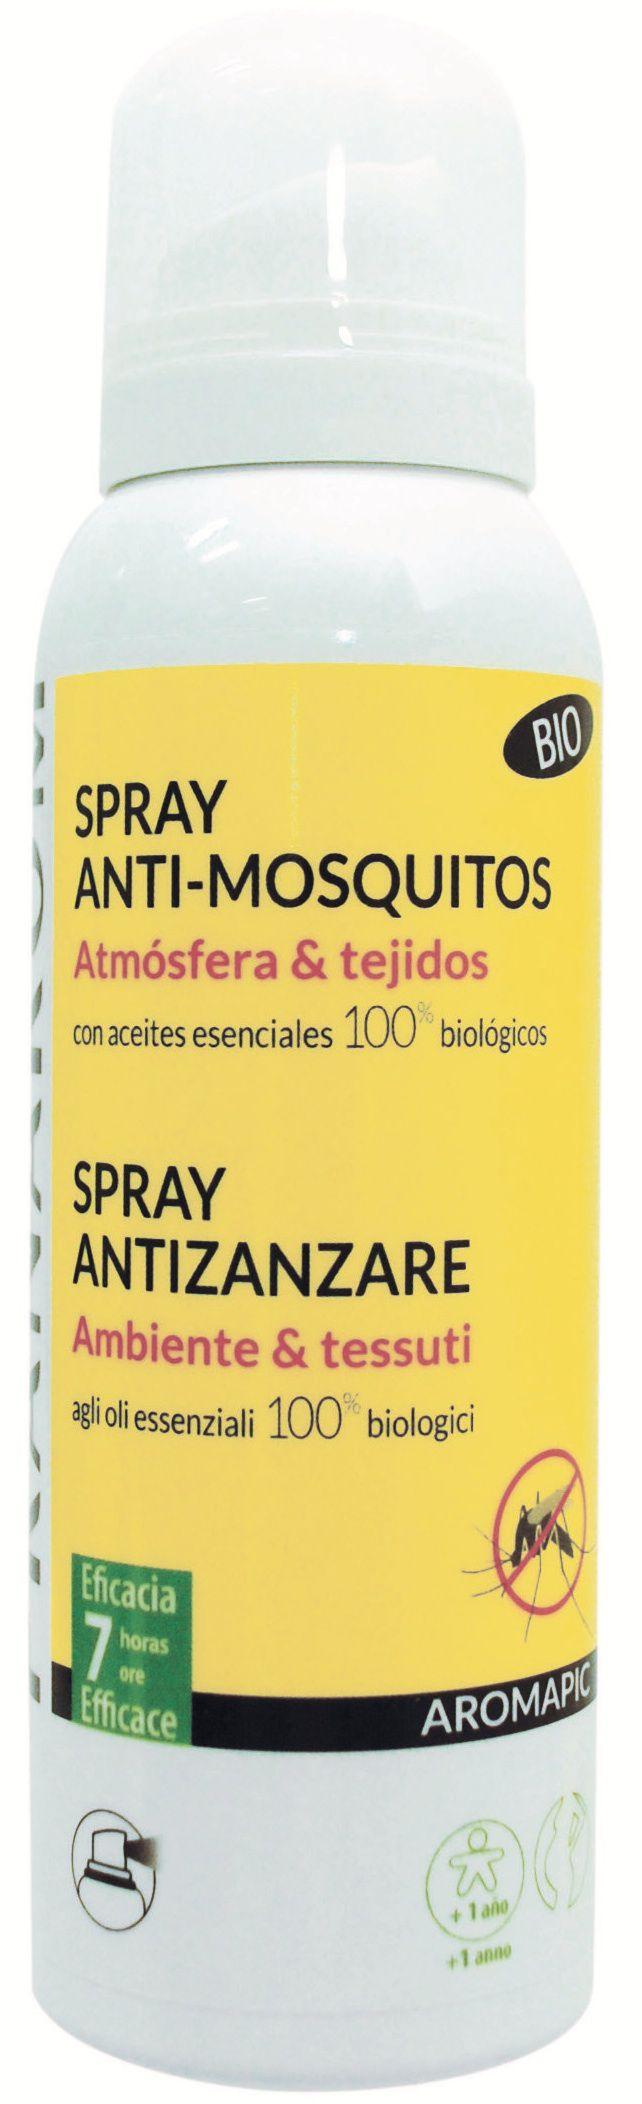 pranarom_aromapic_spray.jpg